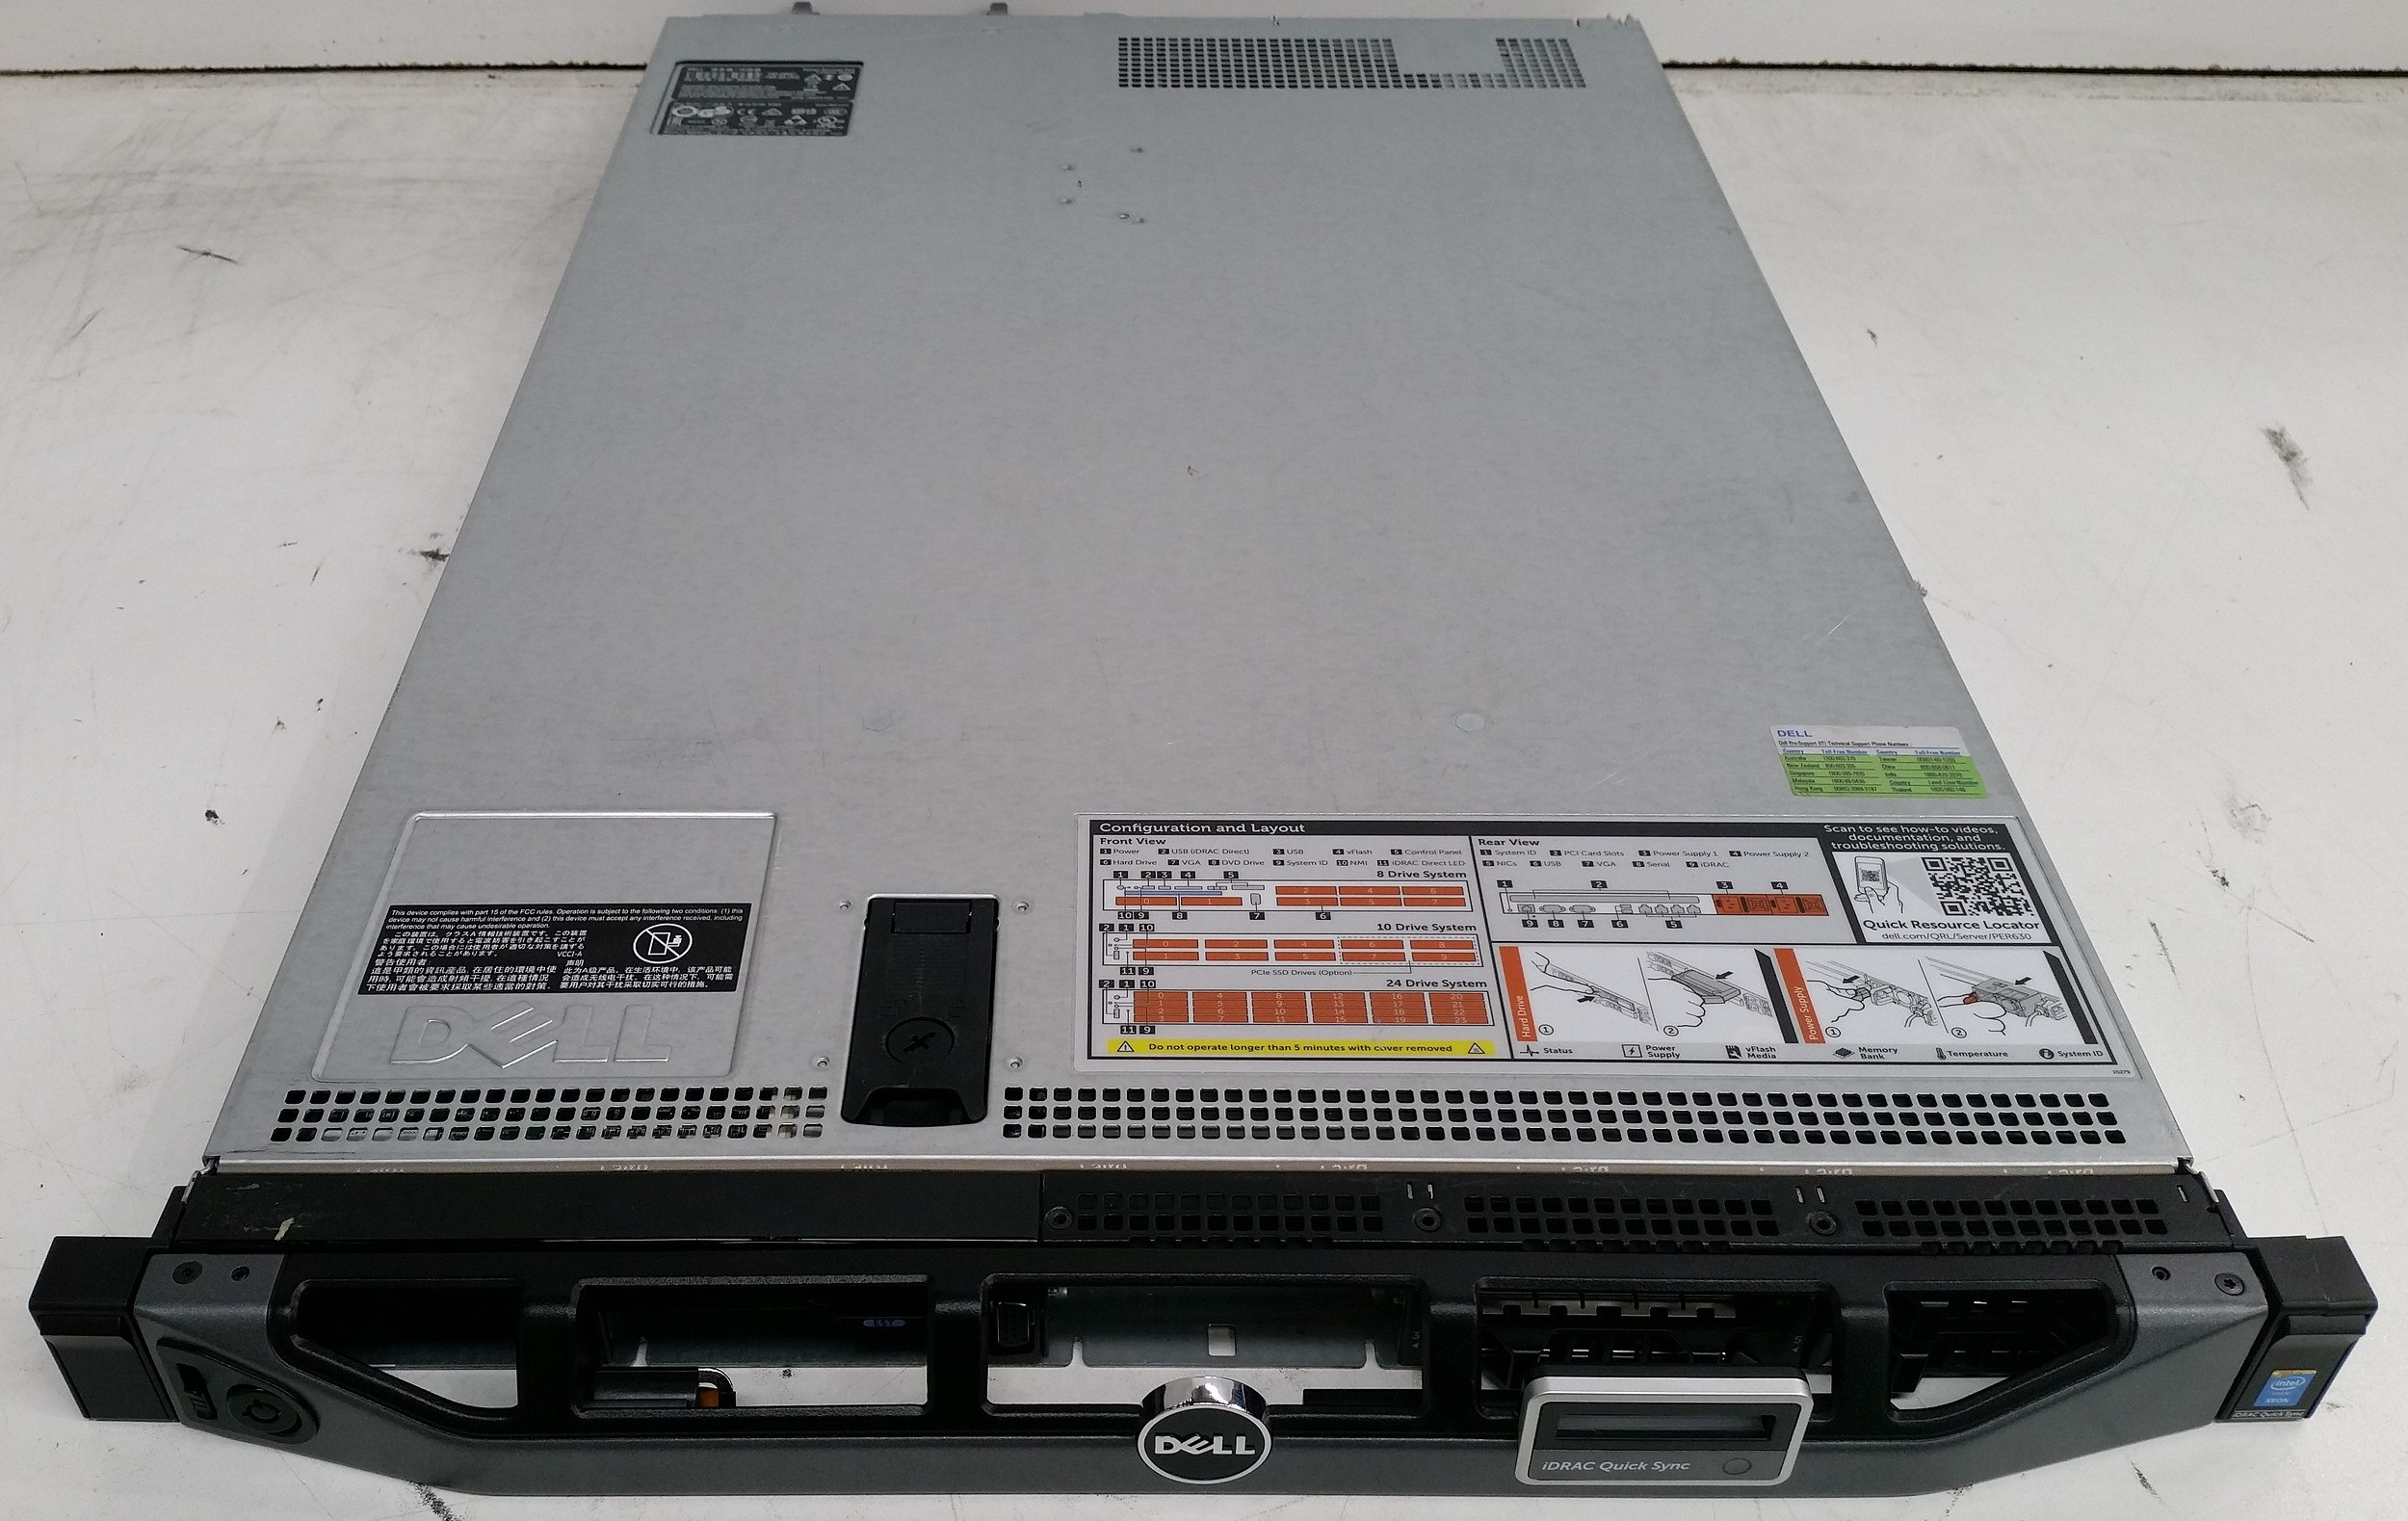 Dell PowerEdge R630 Dual Eight-Core Xeon (E5-2630 v3) 2 40GHz 1 RU Server